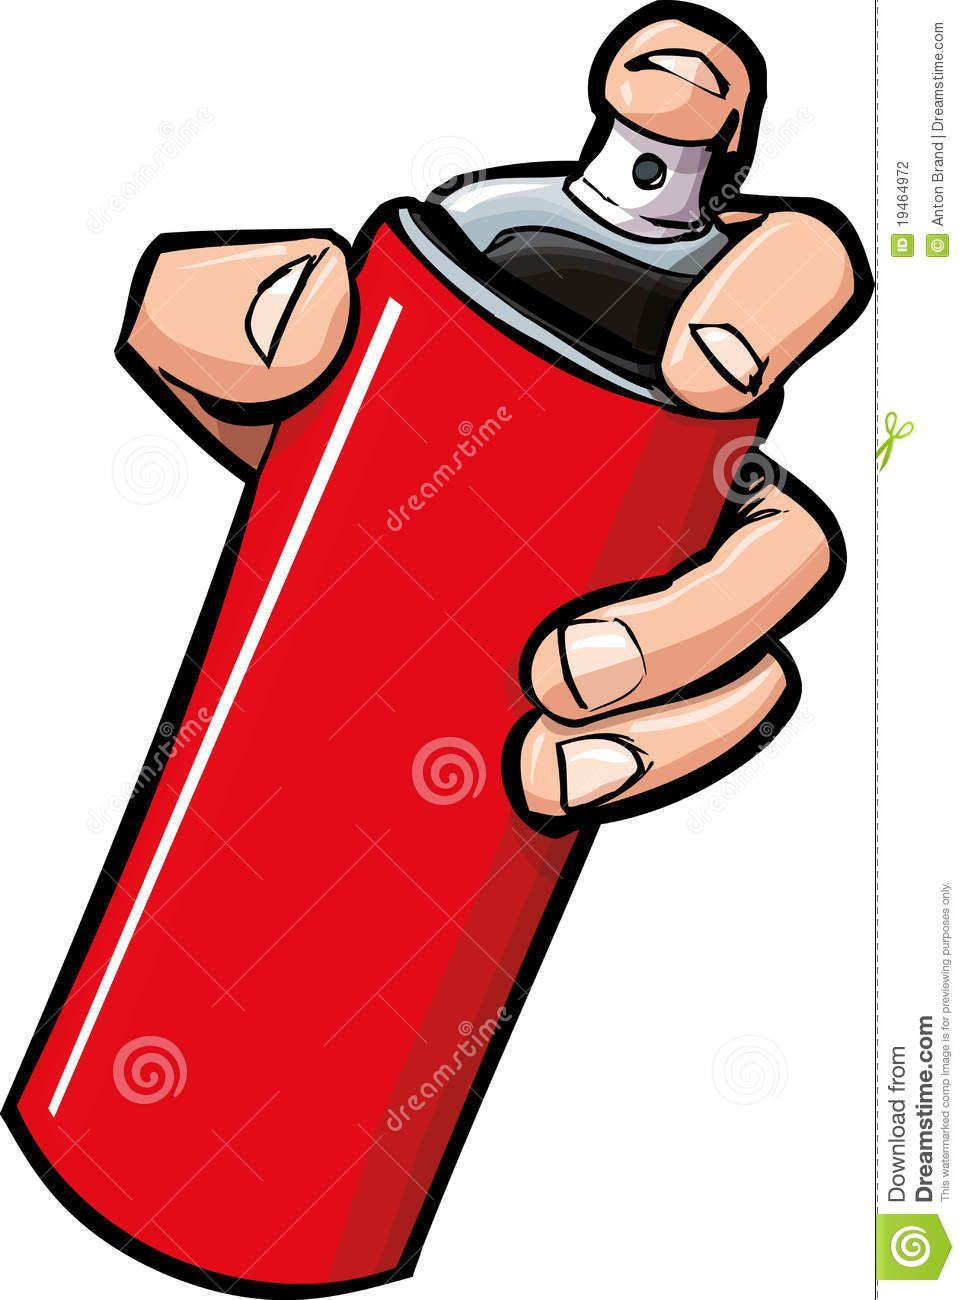 965x1300 Cartoon Hand Holding A Spray Can Stock Photography